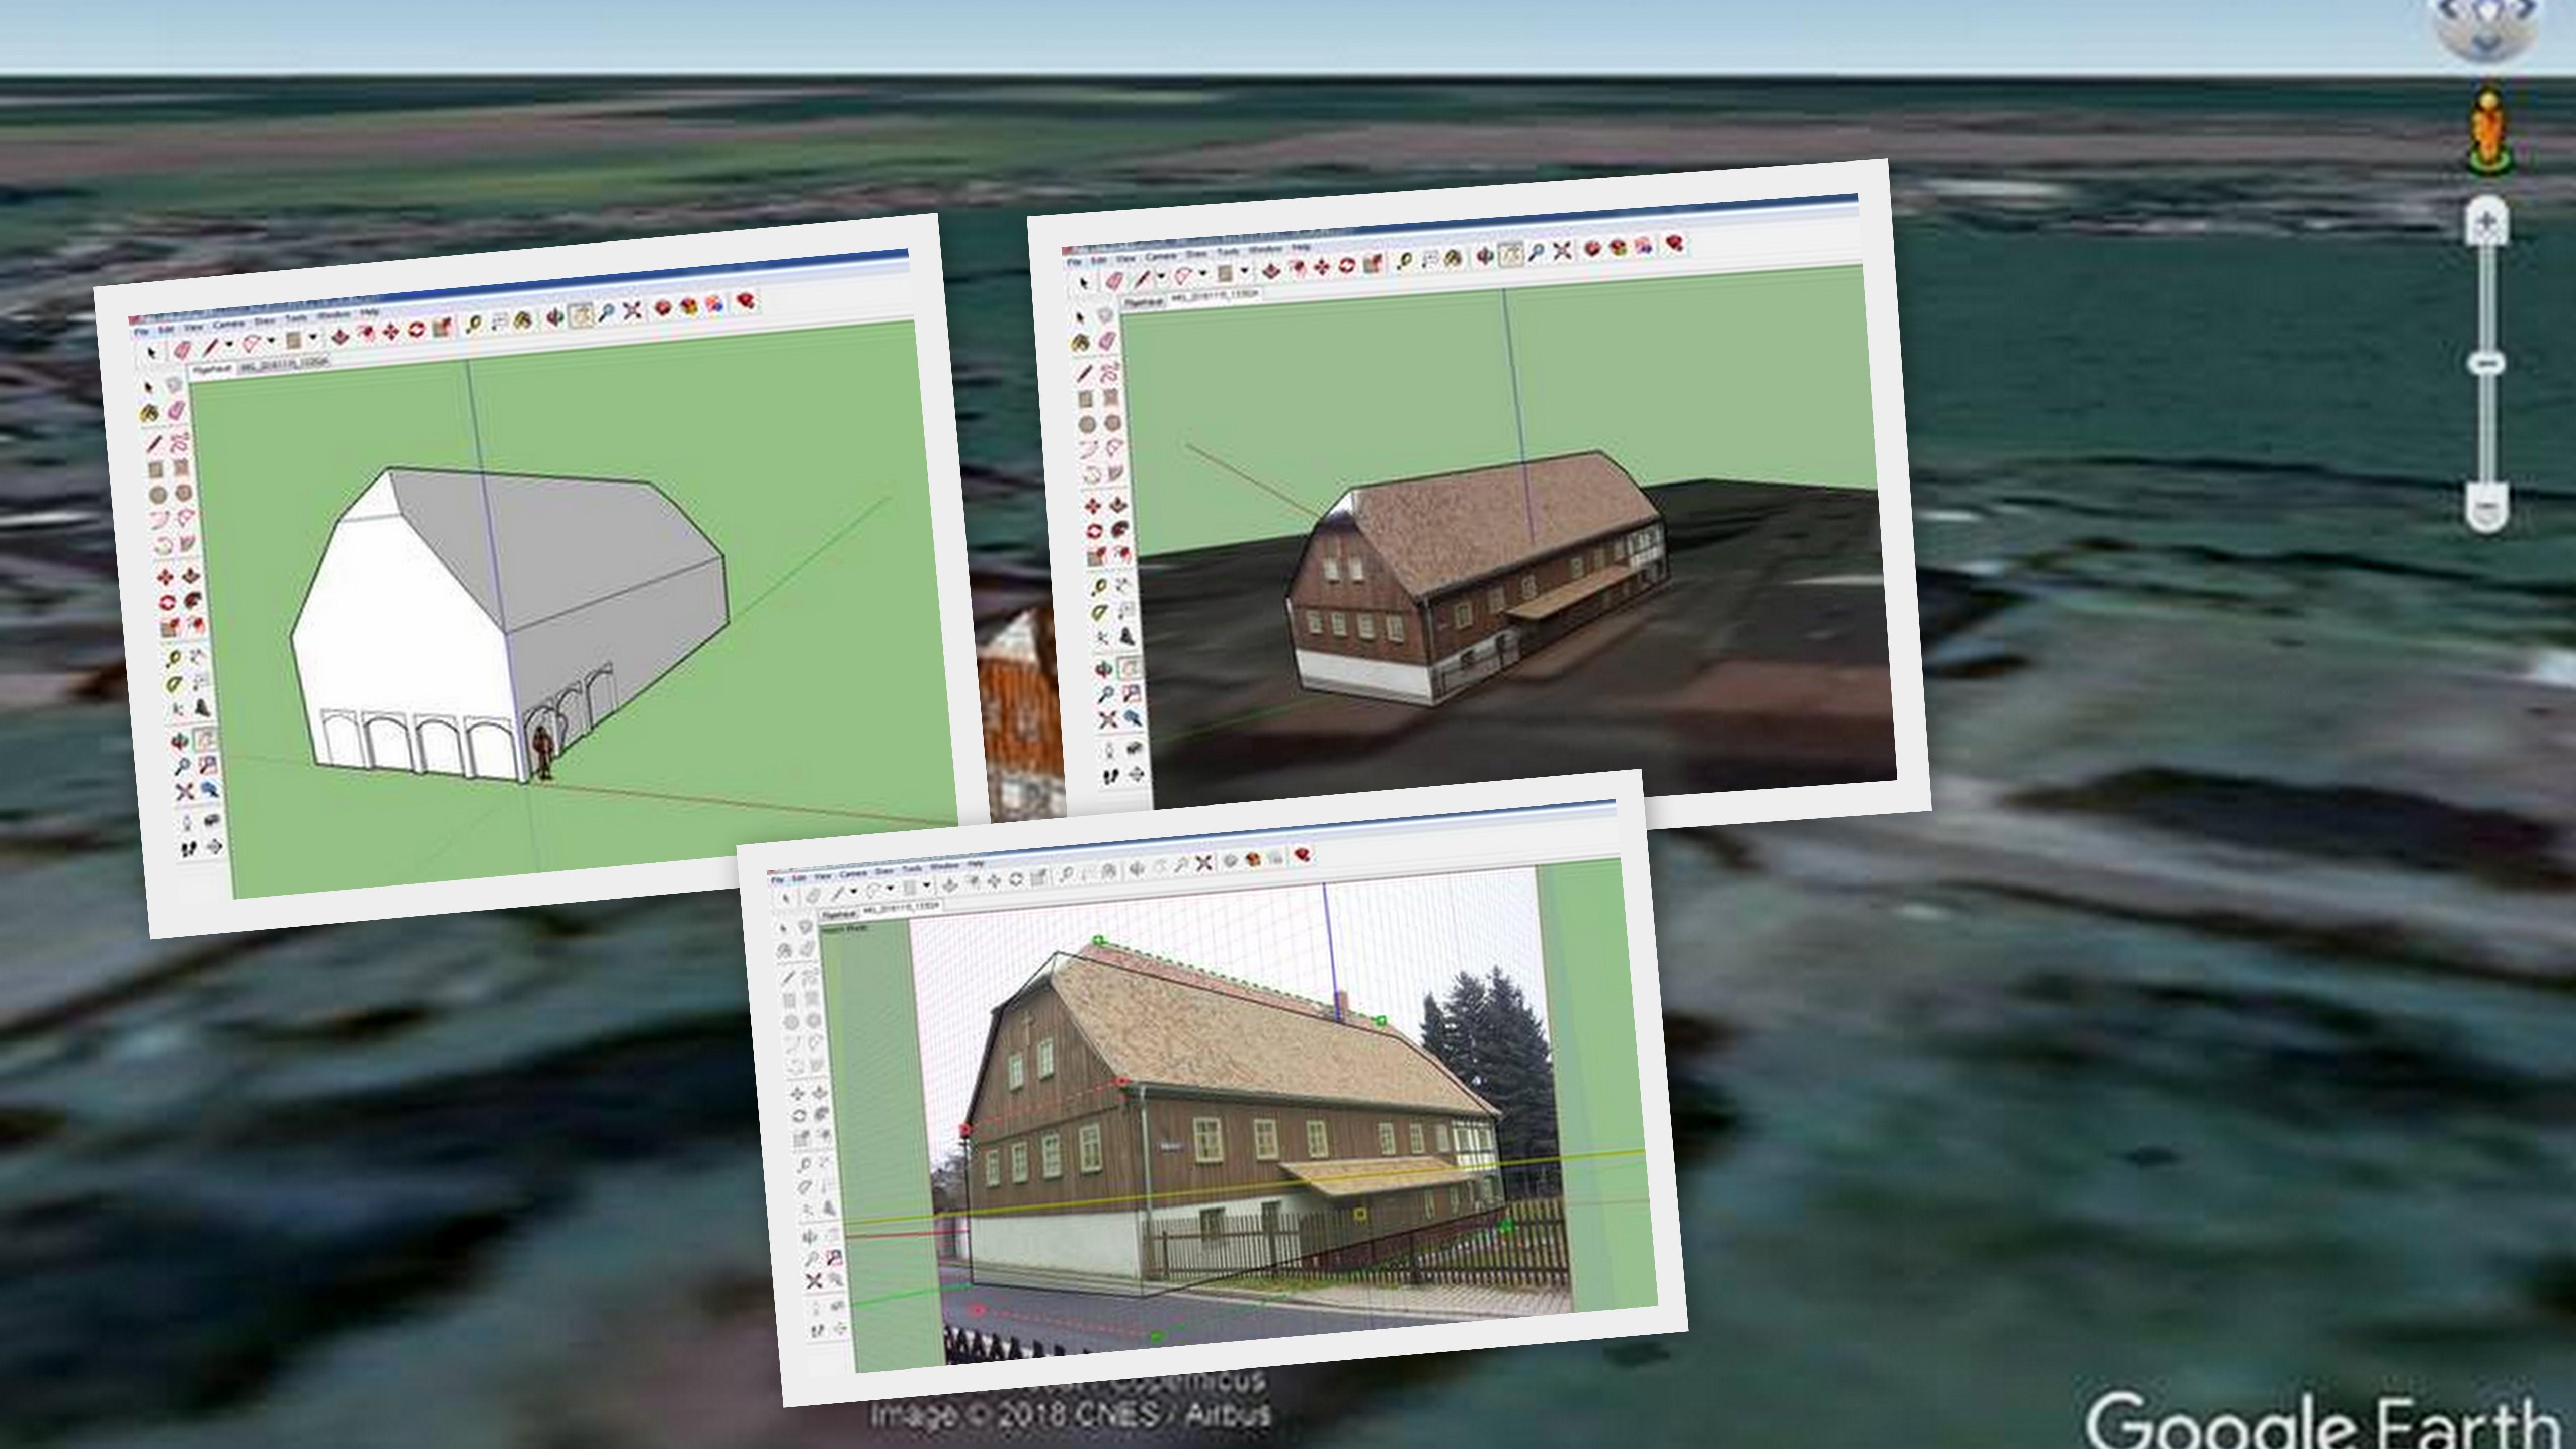 Pilgerhäusel am Computer modellieren und bei Google Earth als 3D-Objekt platzieren